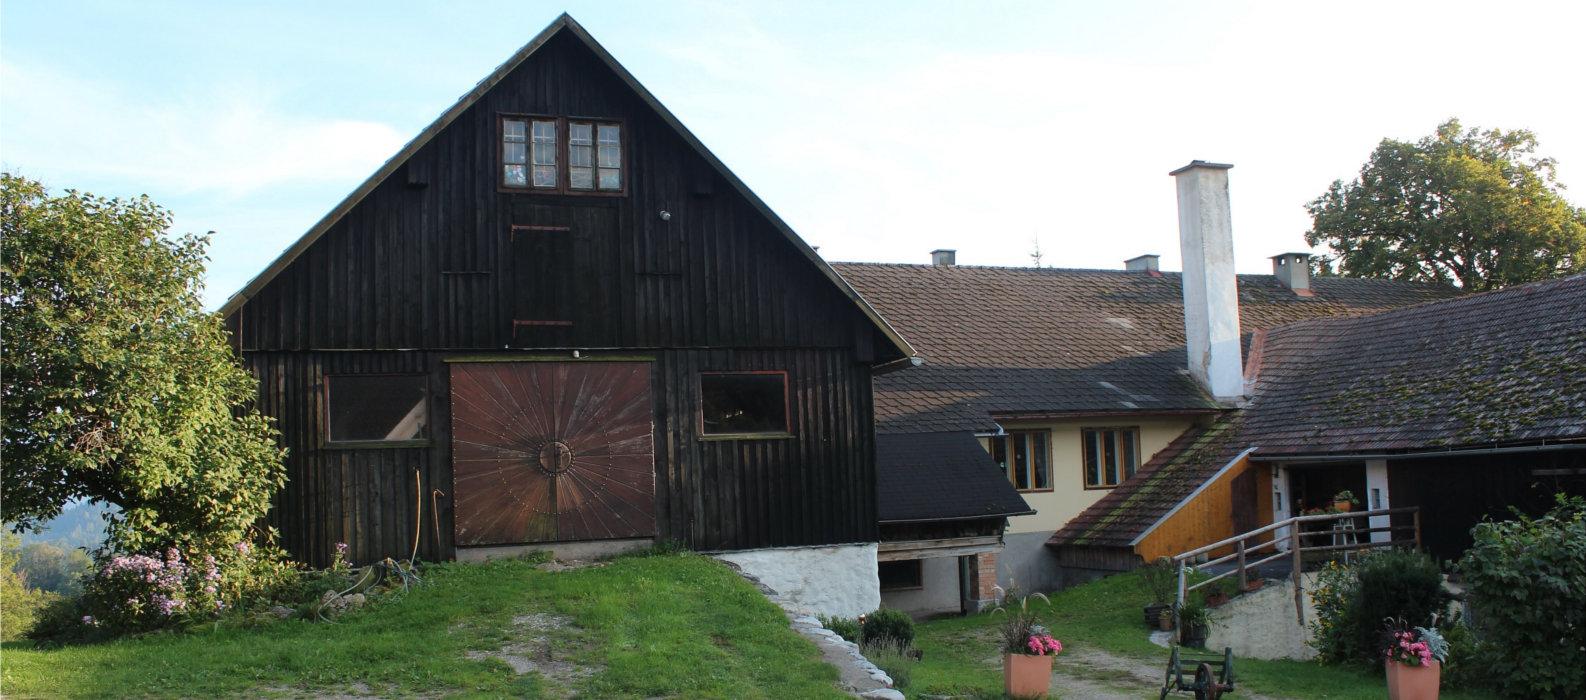 Hirmhof